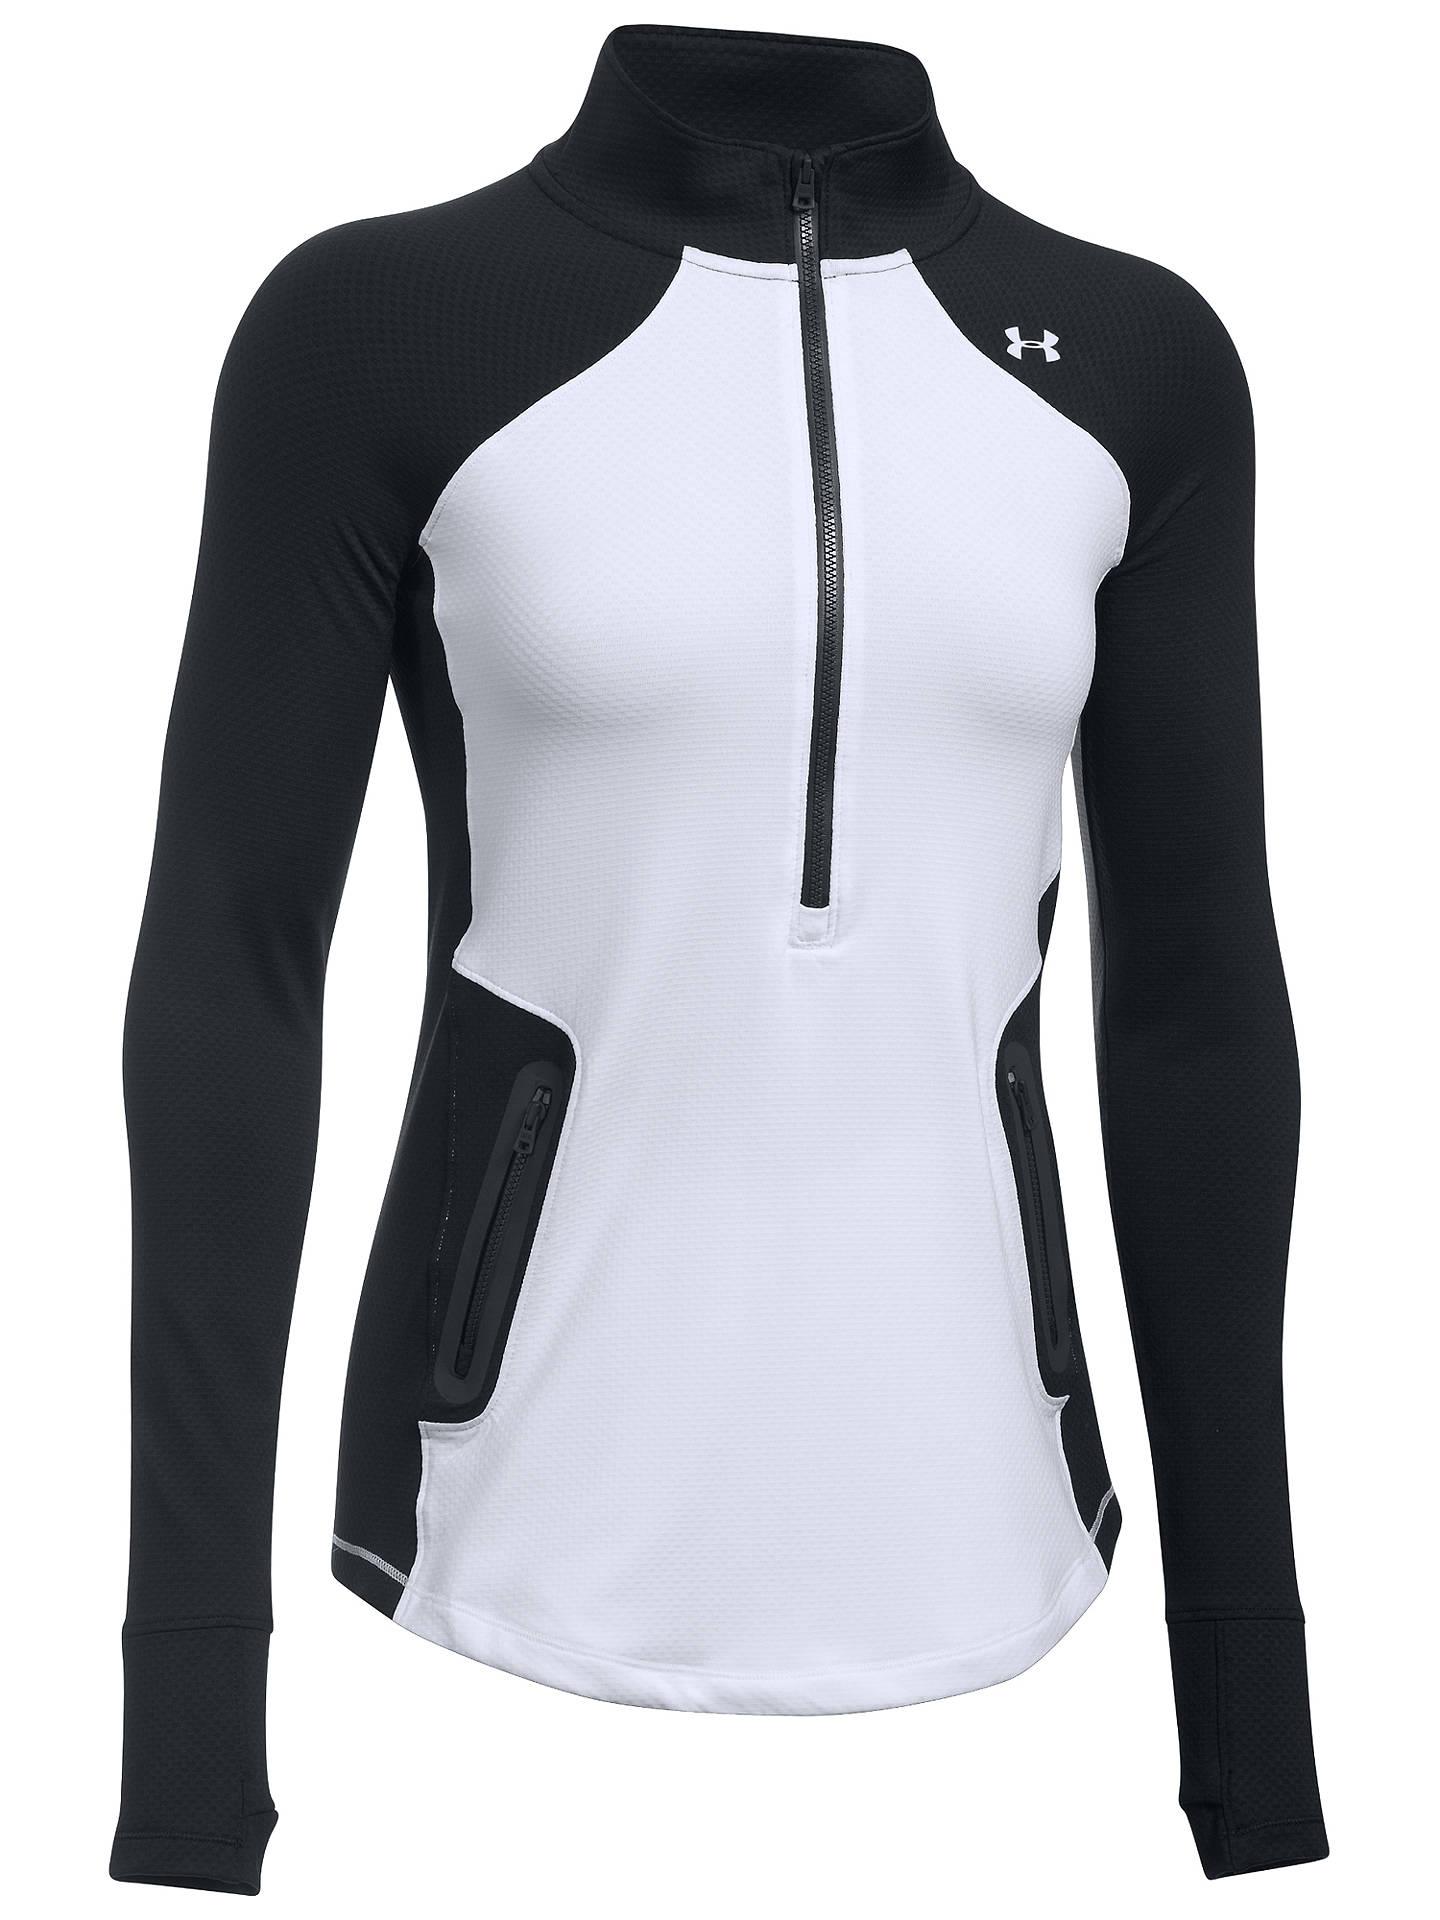 c351e00d ... Buy Under Armour ColdGear Reactor Zip Long Sleeve Training Shirt,  White/Black, XS ...